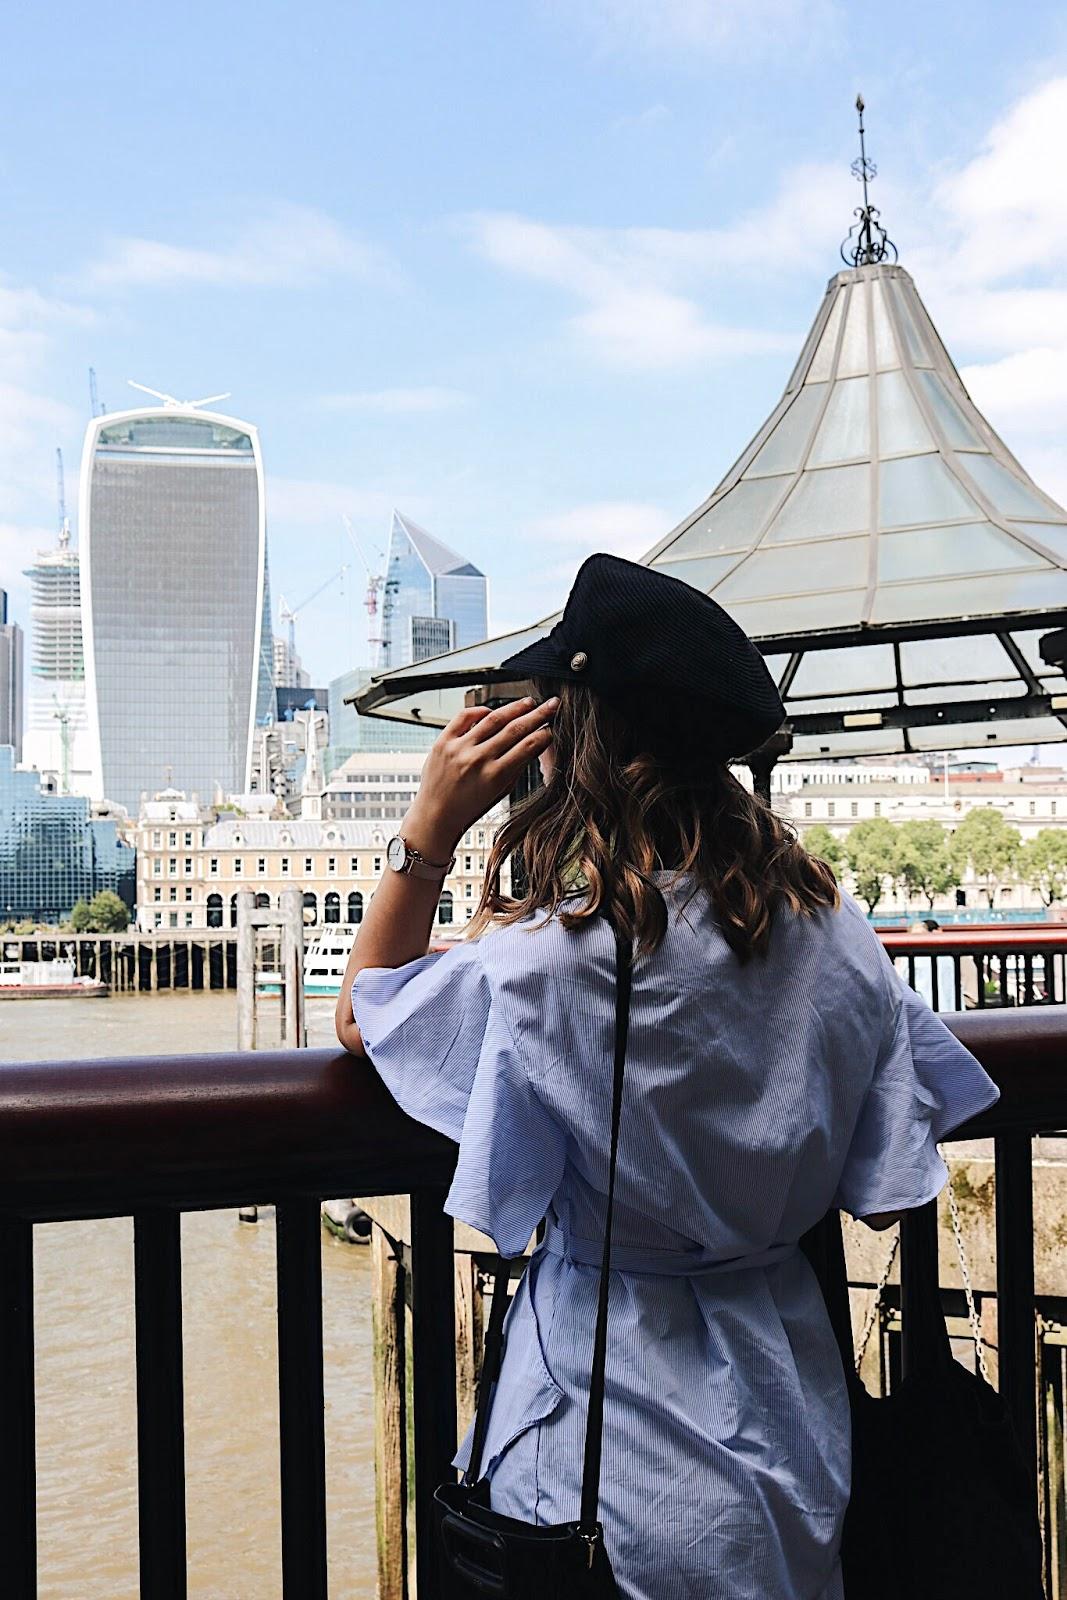 pauline-dress-blog-mode-deco-lifestyle-travel-voyage-europe-londres-angleterre-idees-visites-parcours-touristique-instagram-instagrammable-lieux-city